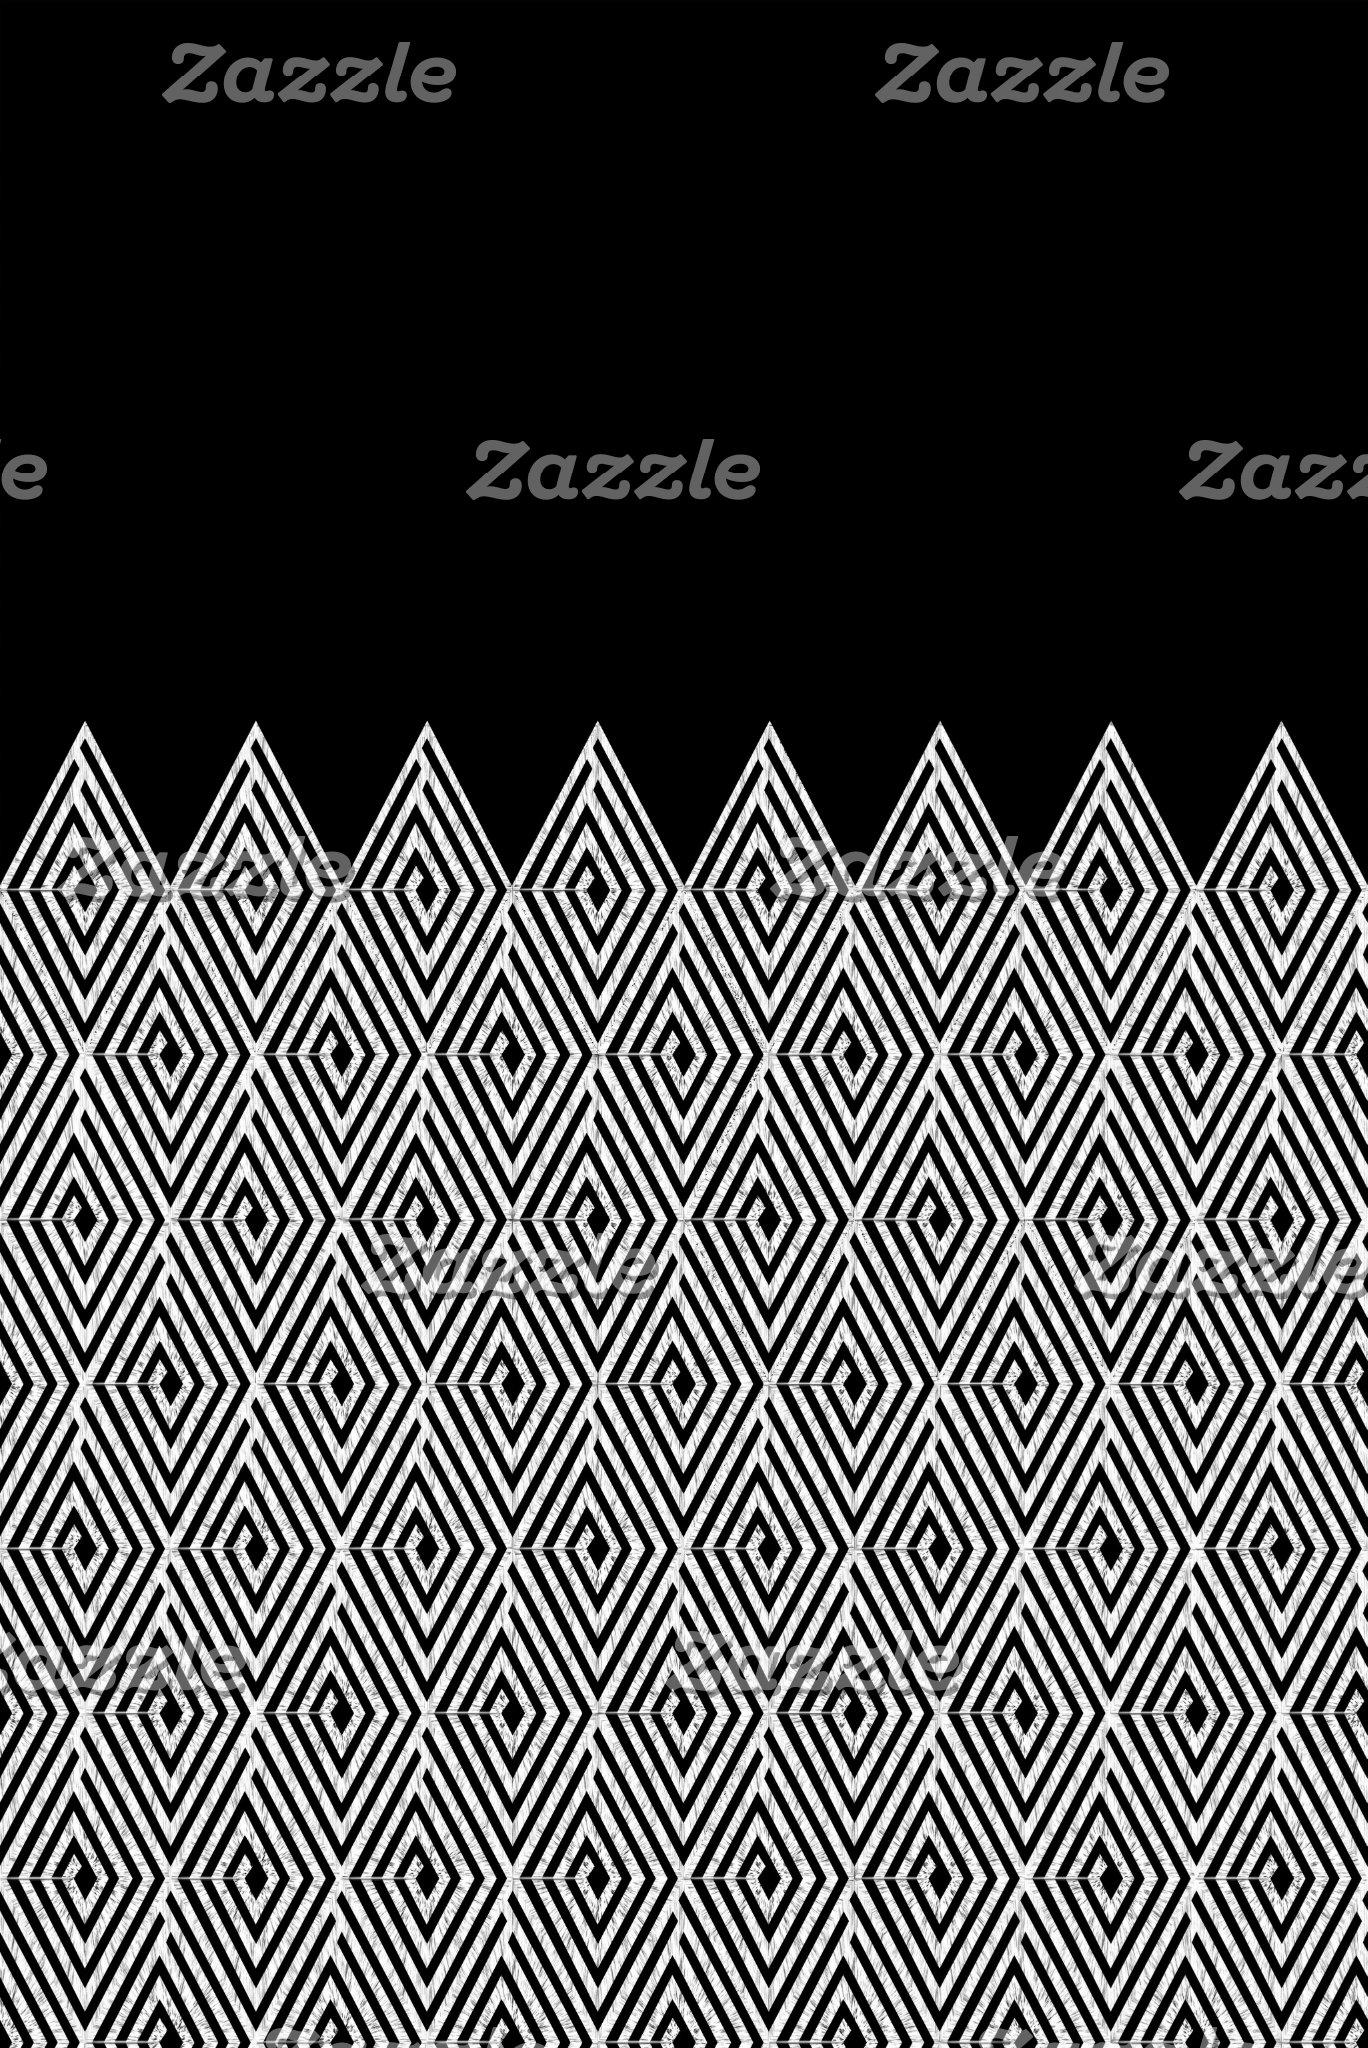 Zigzag Tribal pattern